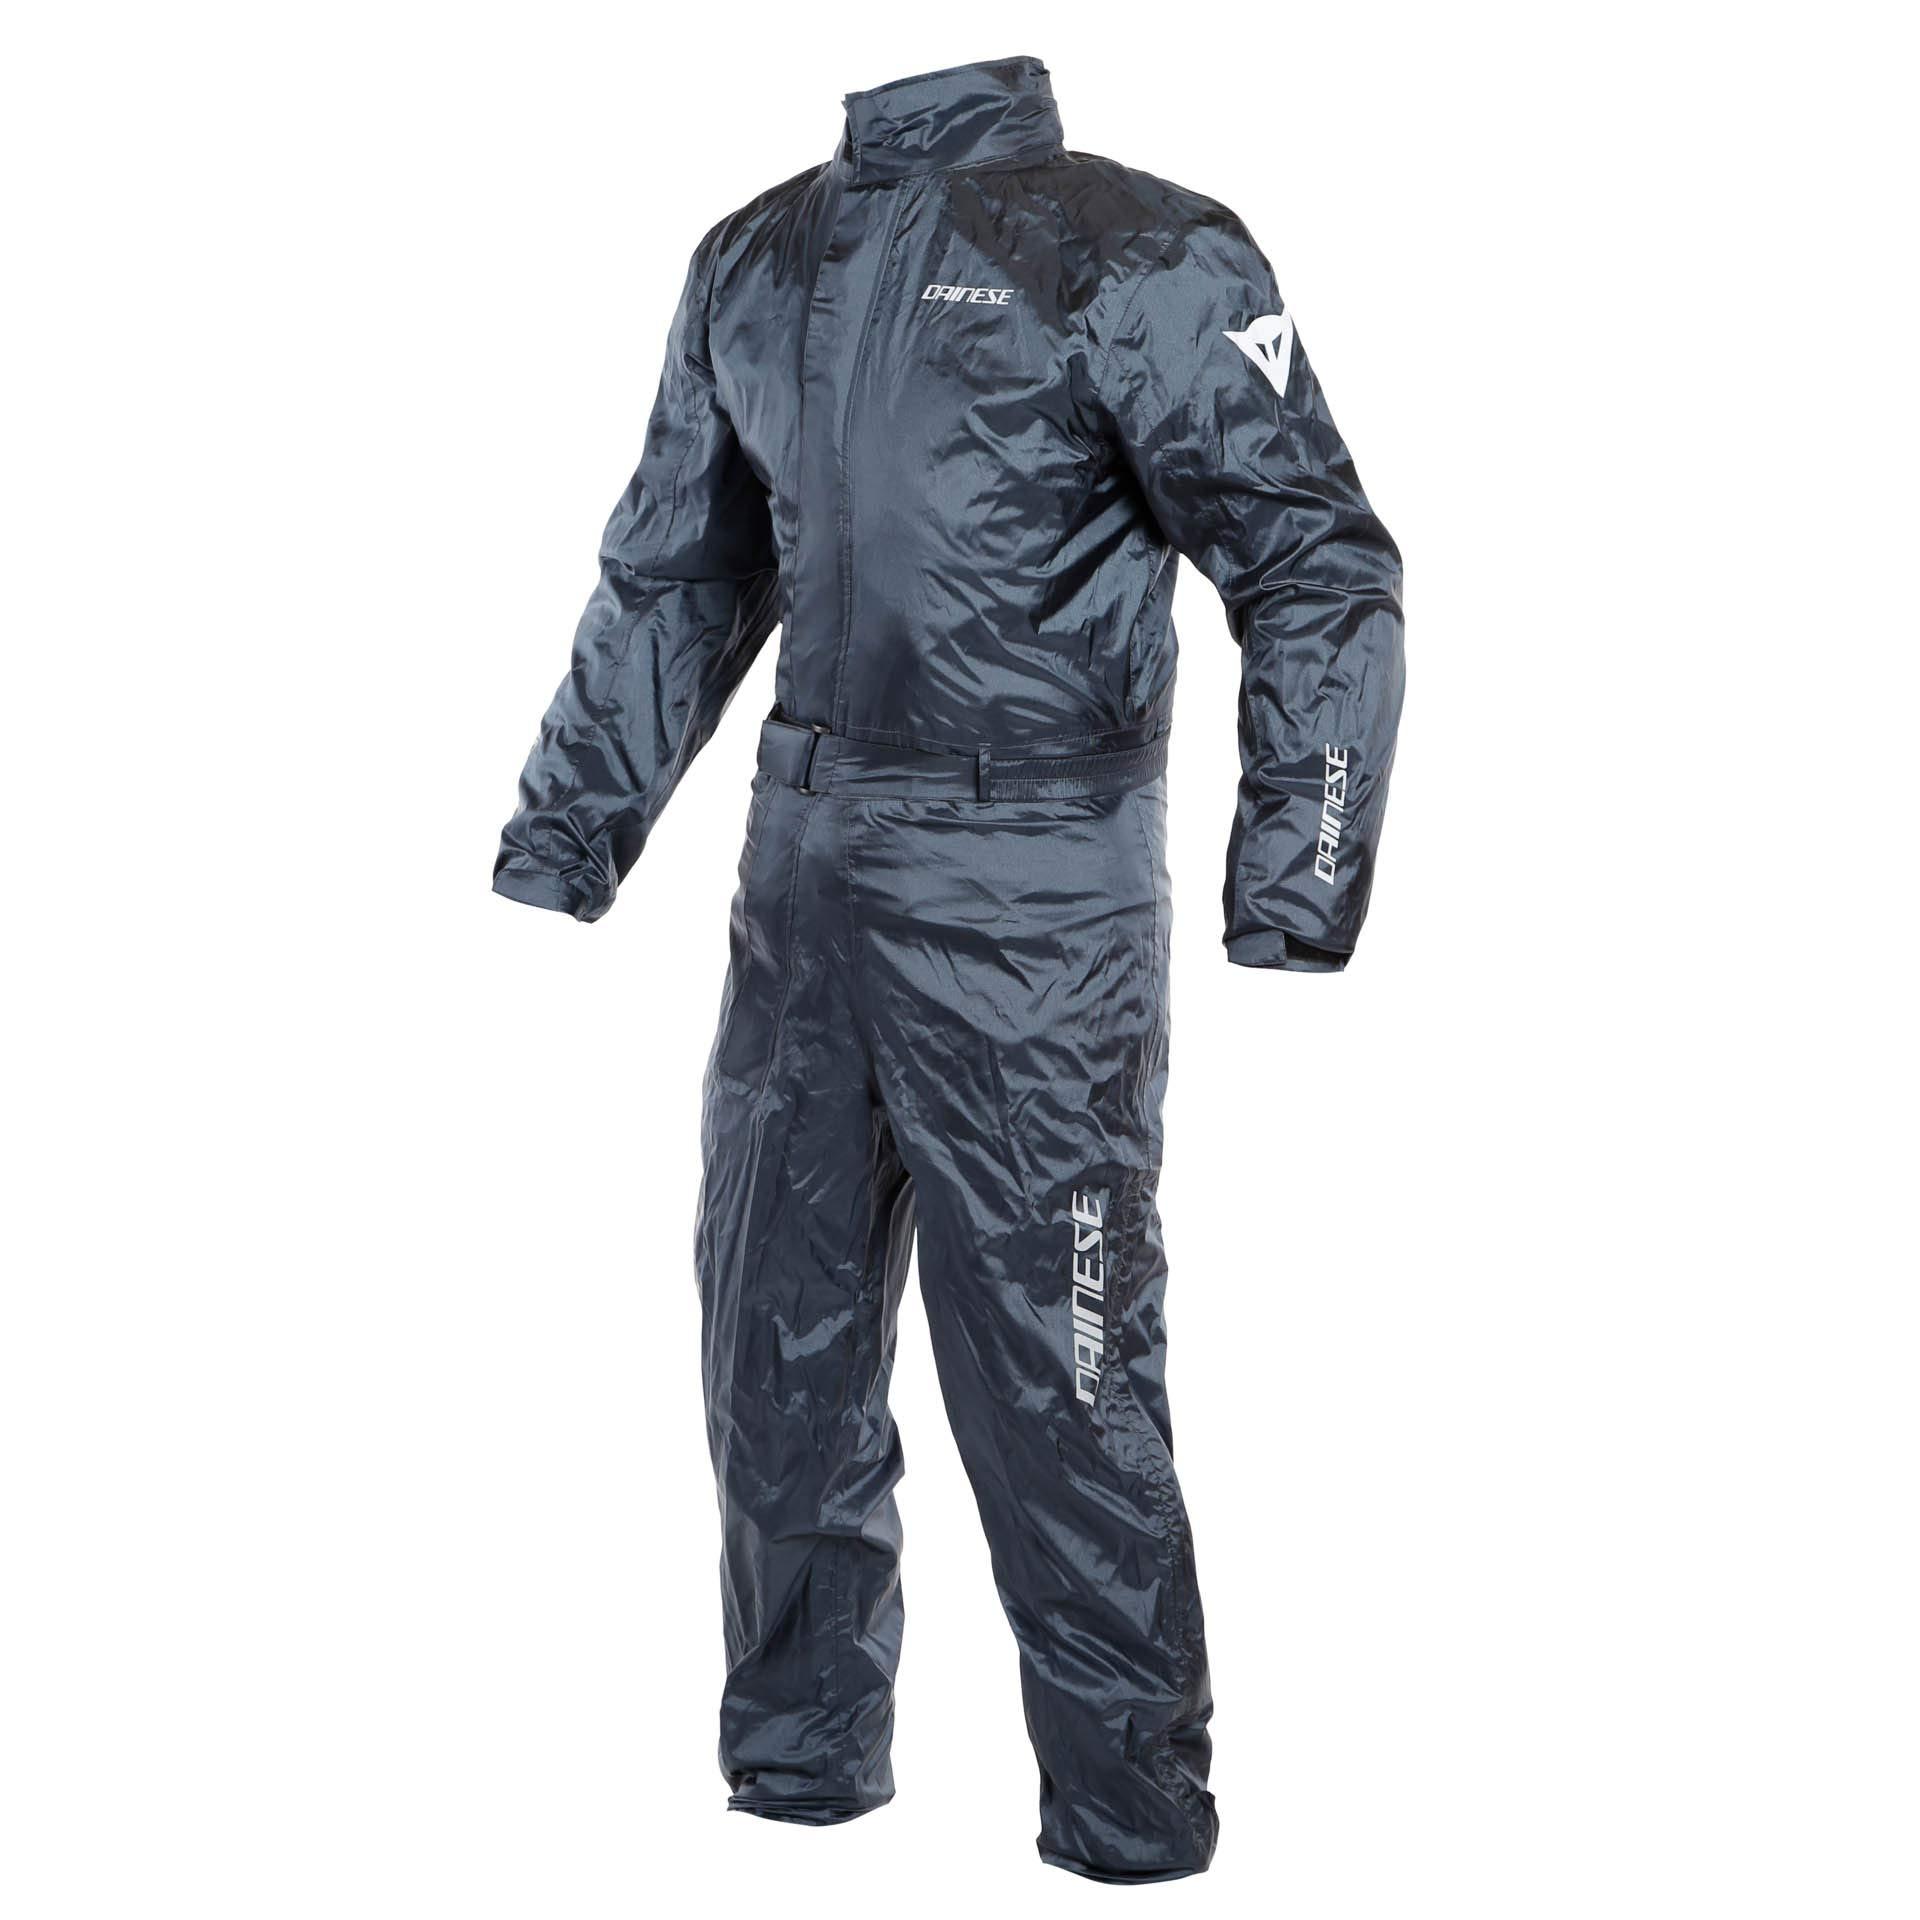 Dainese Men's Rain Suit Antrax Small